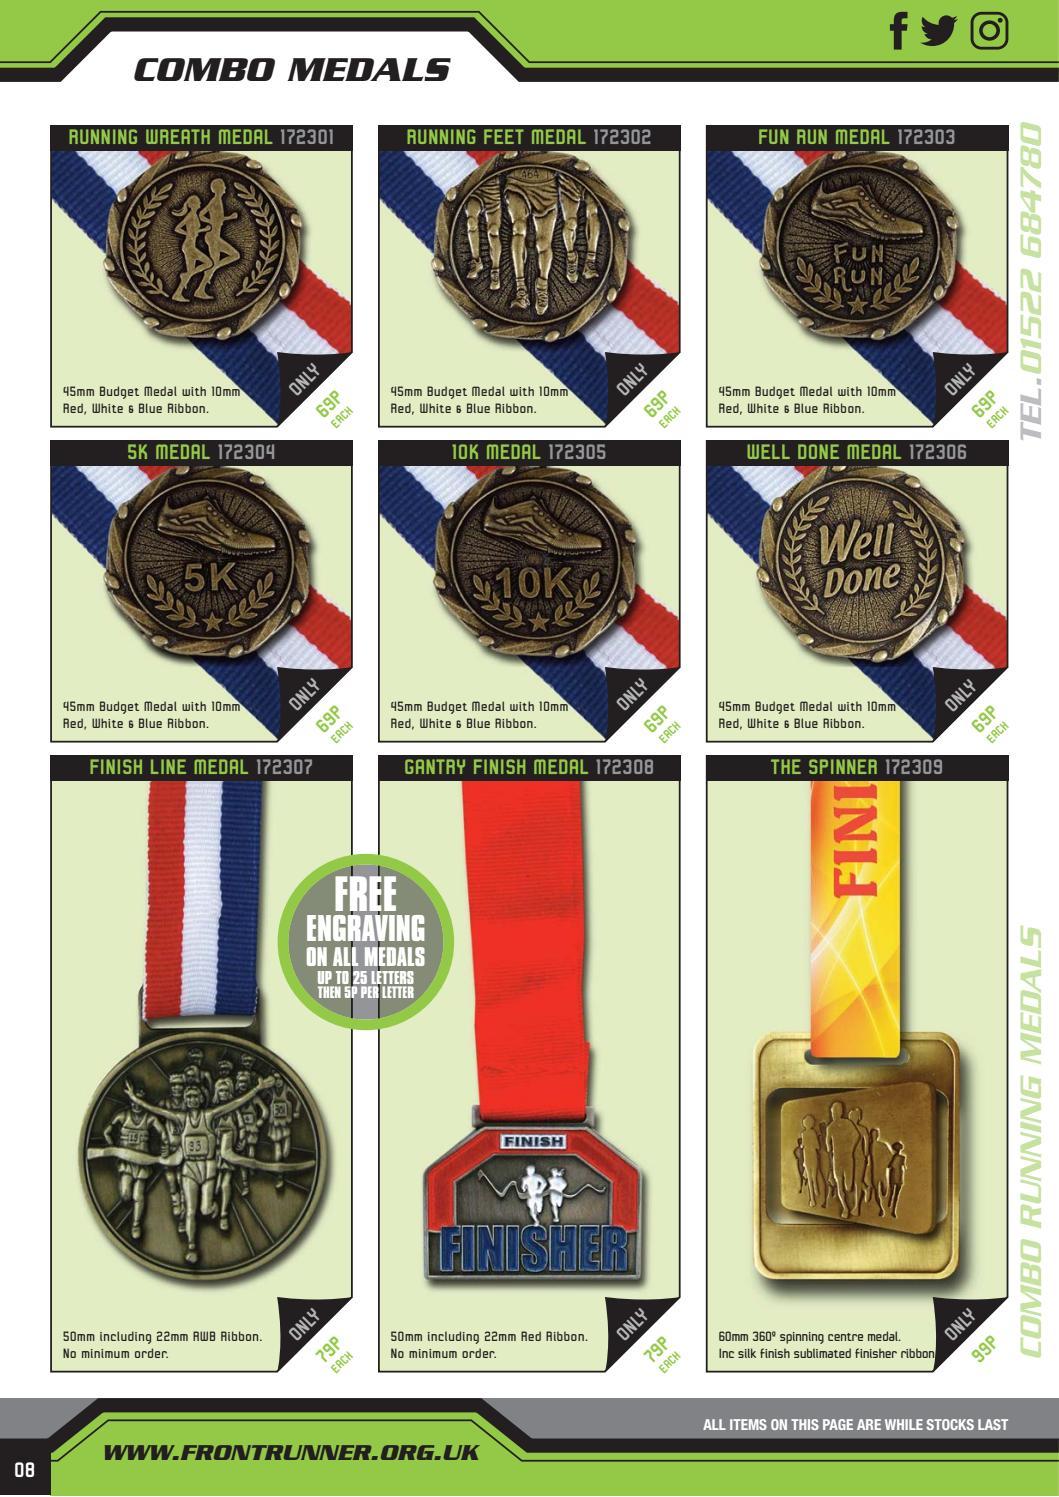 Frontrunner Medals Brochure 2017 by PaulStafford - issuu